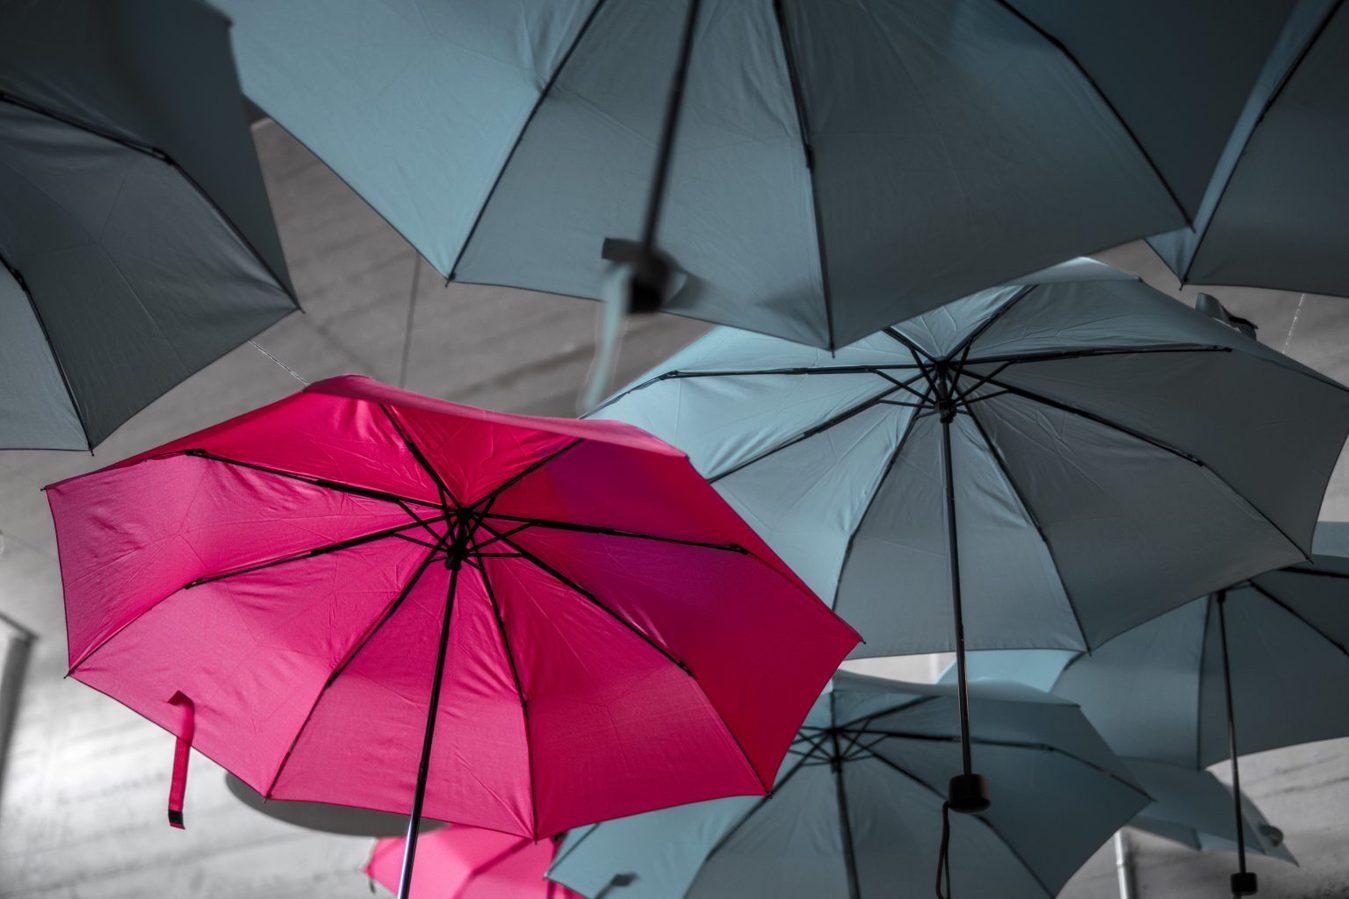 pink umbrella among several grey umbrellas